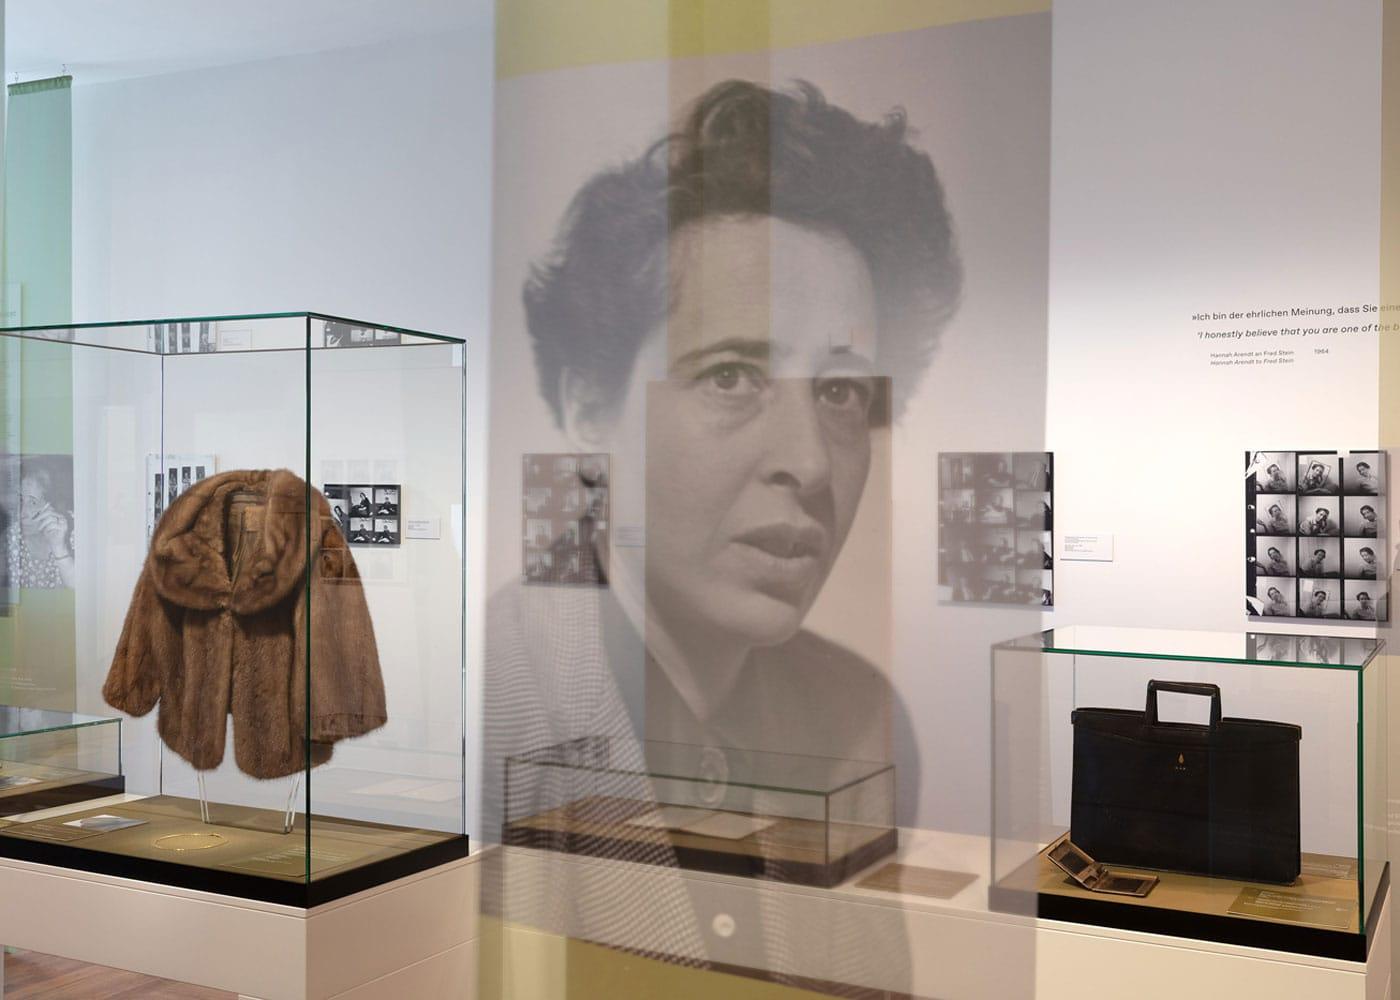 Hannah Arendt Ausstellung im Deutschen Historischen Museum Berlin // HIMBEER